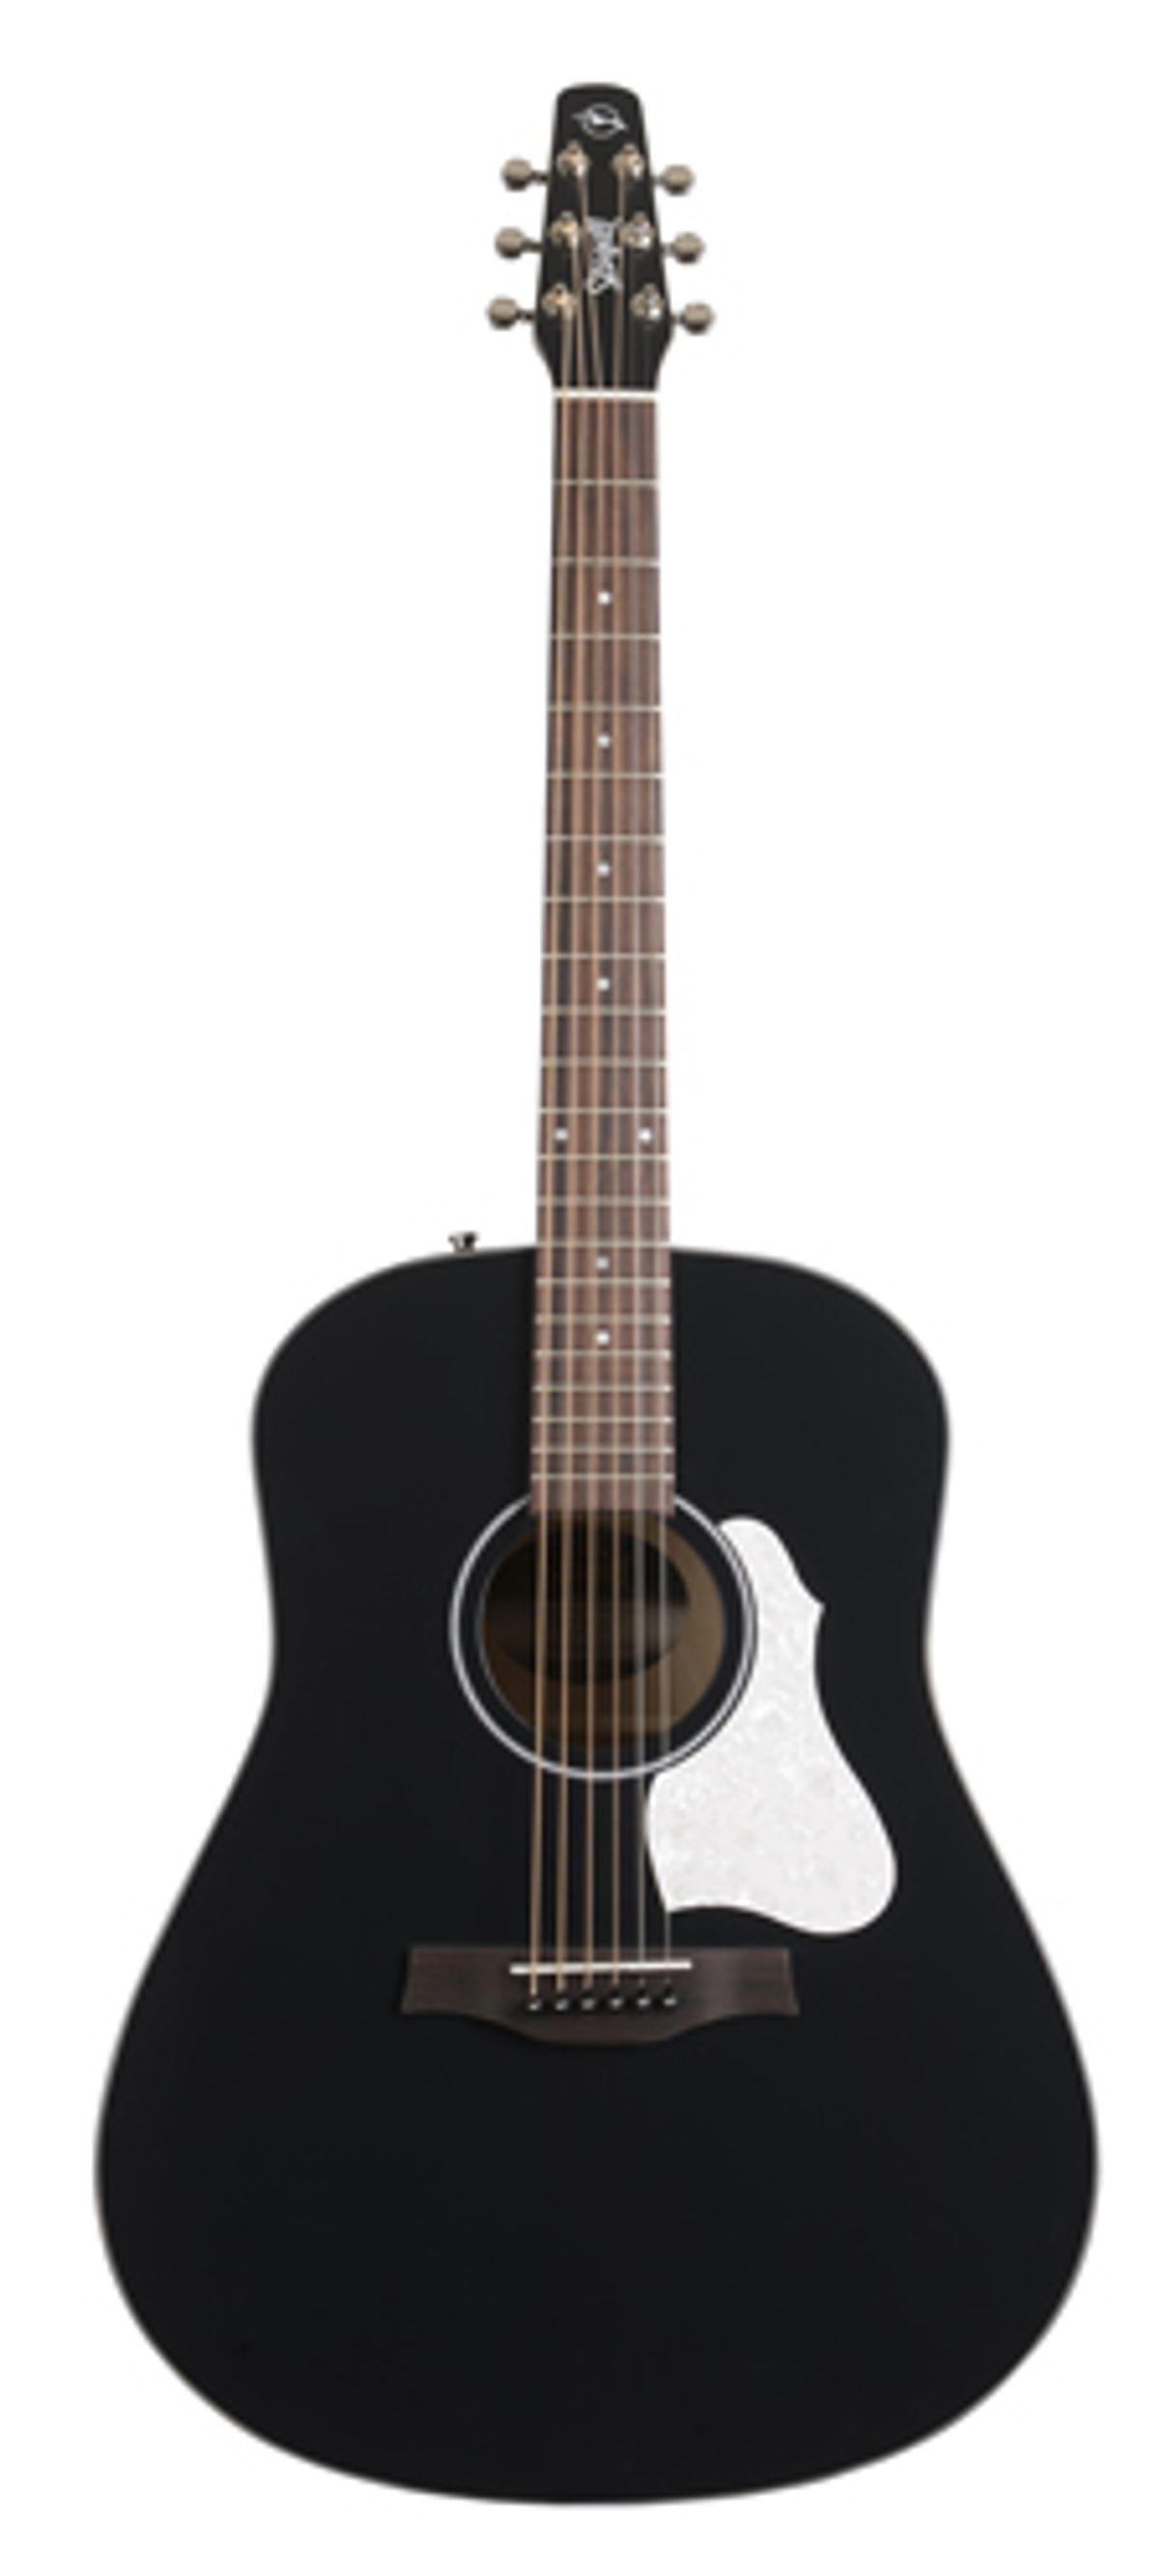 Seagull Guitars Unveils the S6 Classic Black